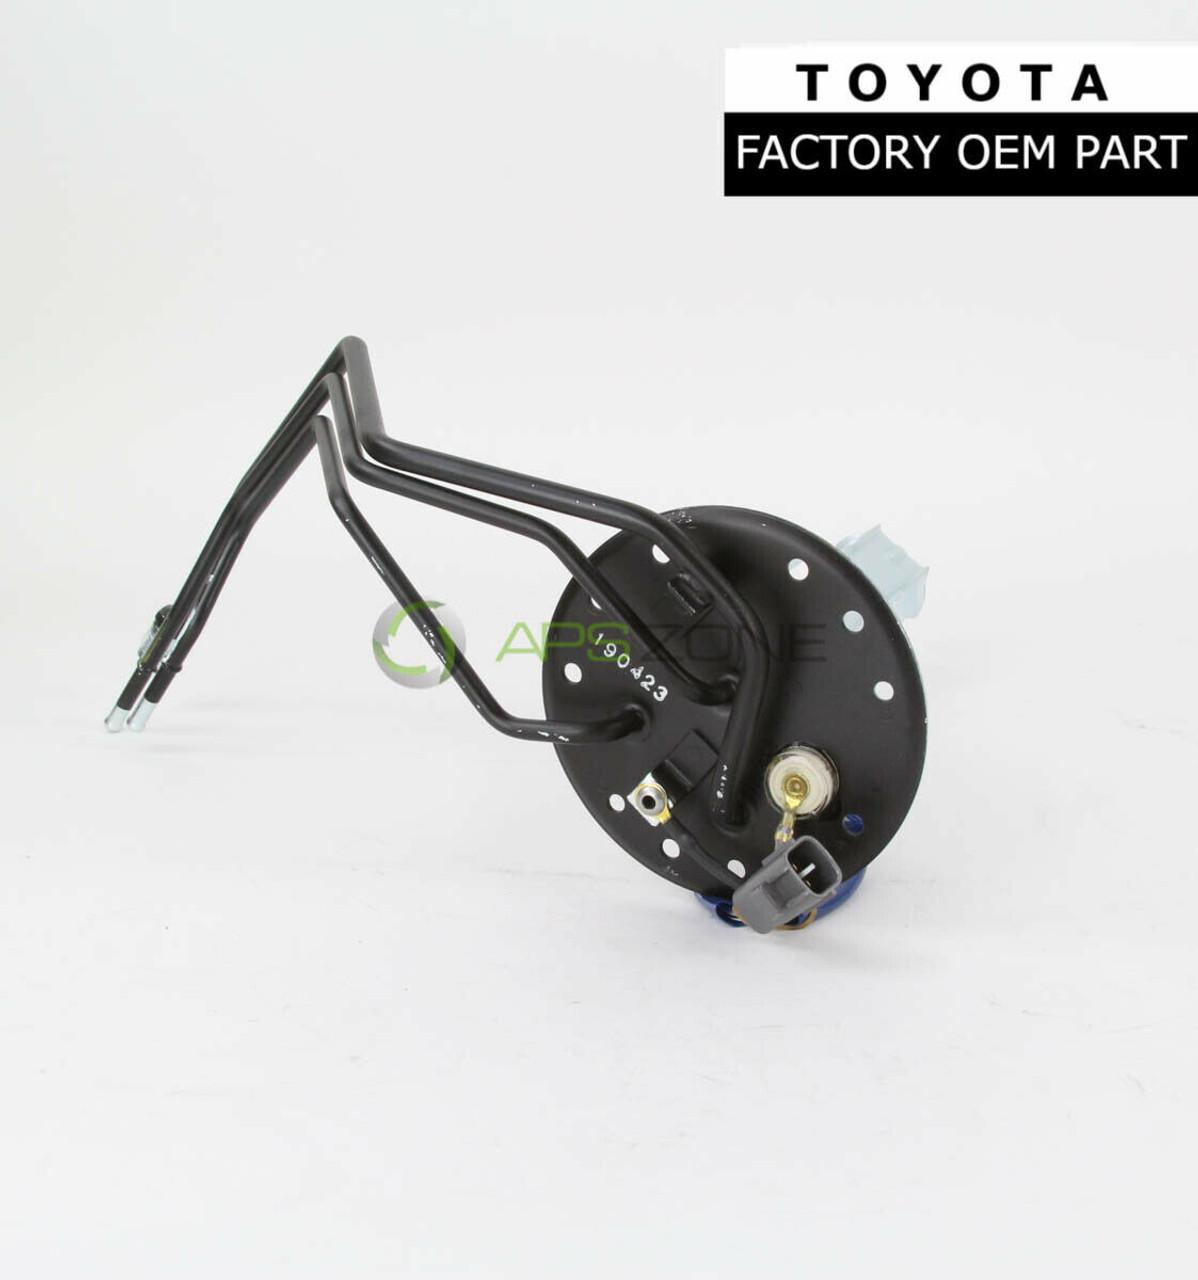 Genuine Toyota 15767-31020 Engine Oil Cooler Pipe